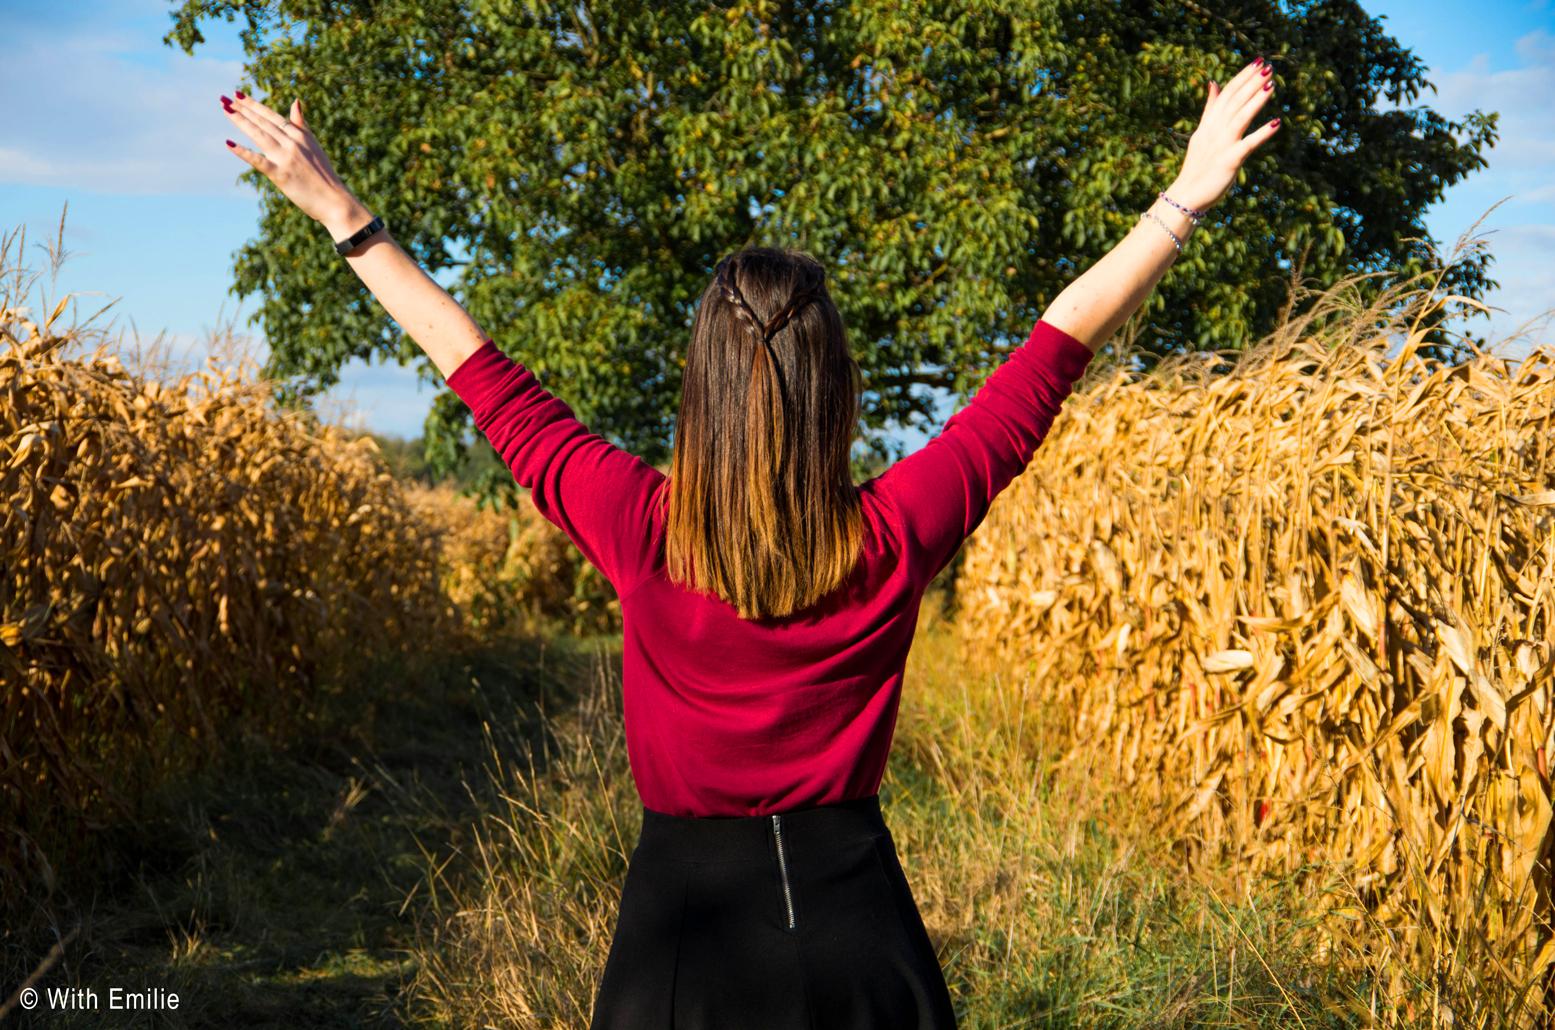 Fall-bucket-list-Fall-photoshoot-WithEmilie